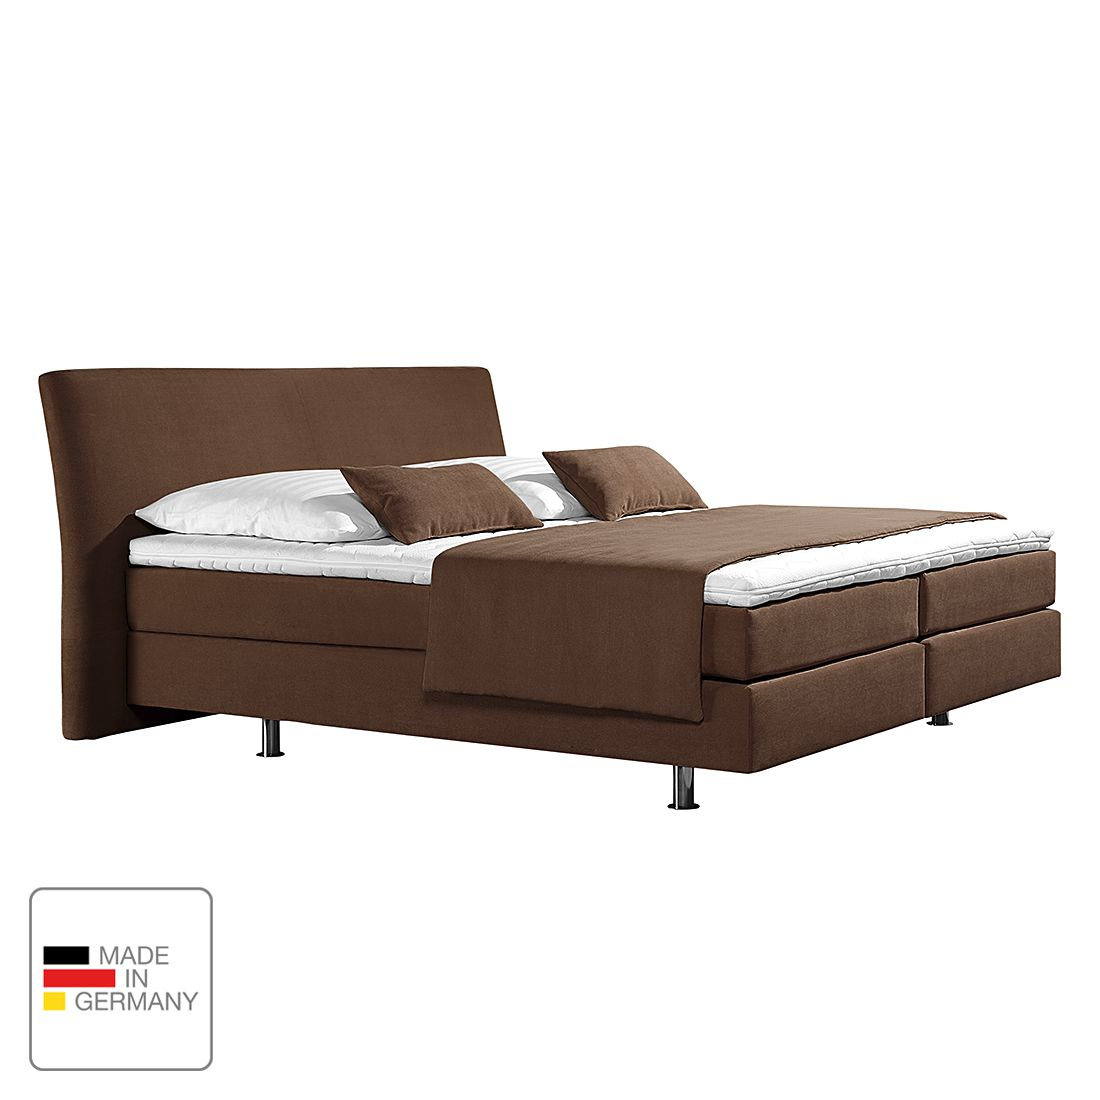 home24 Boxspringbett Cadis   Schlafzimmer > Betten > Boxspringbetten   Braun   loftscape